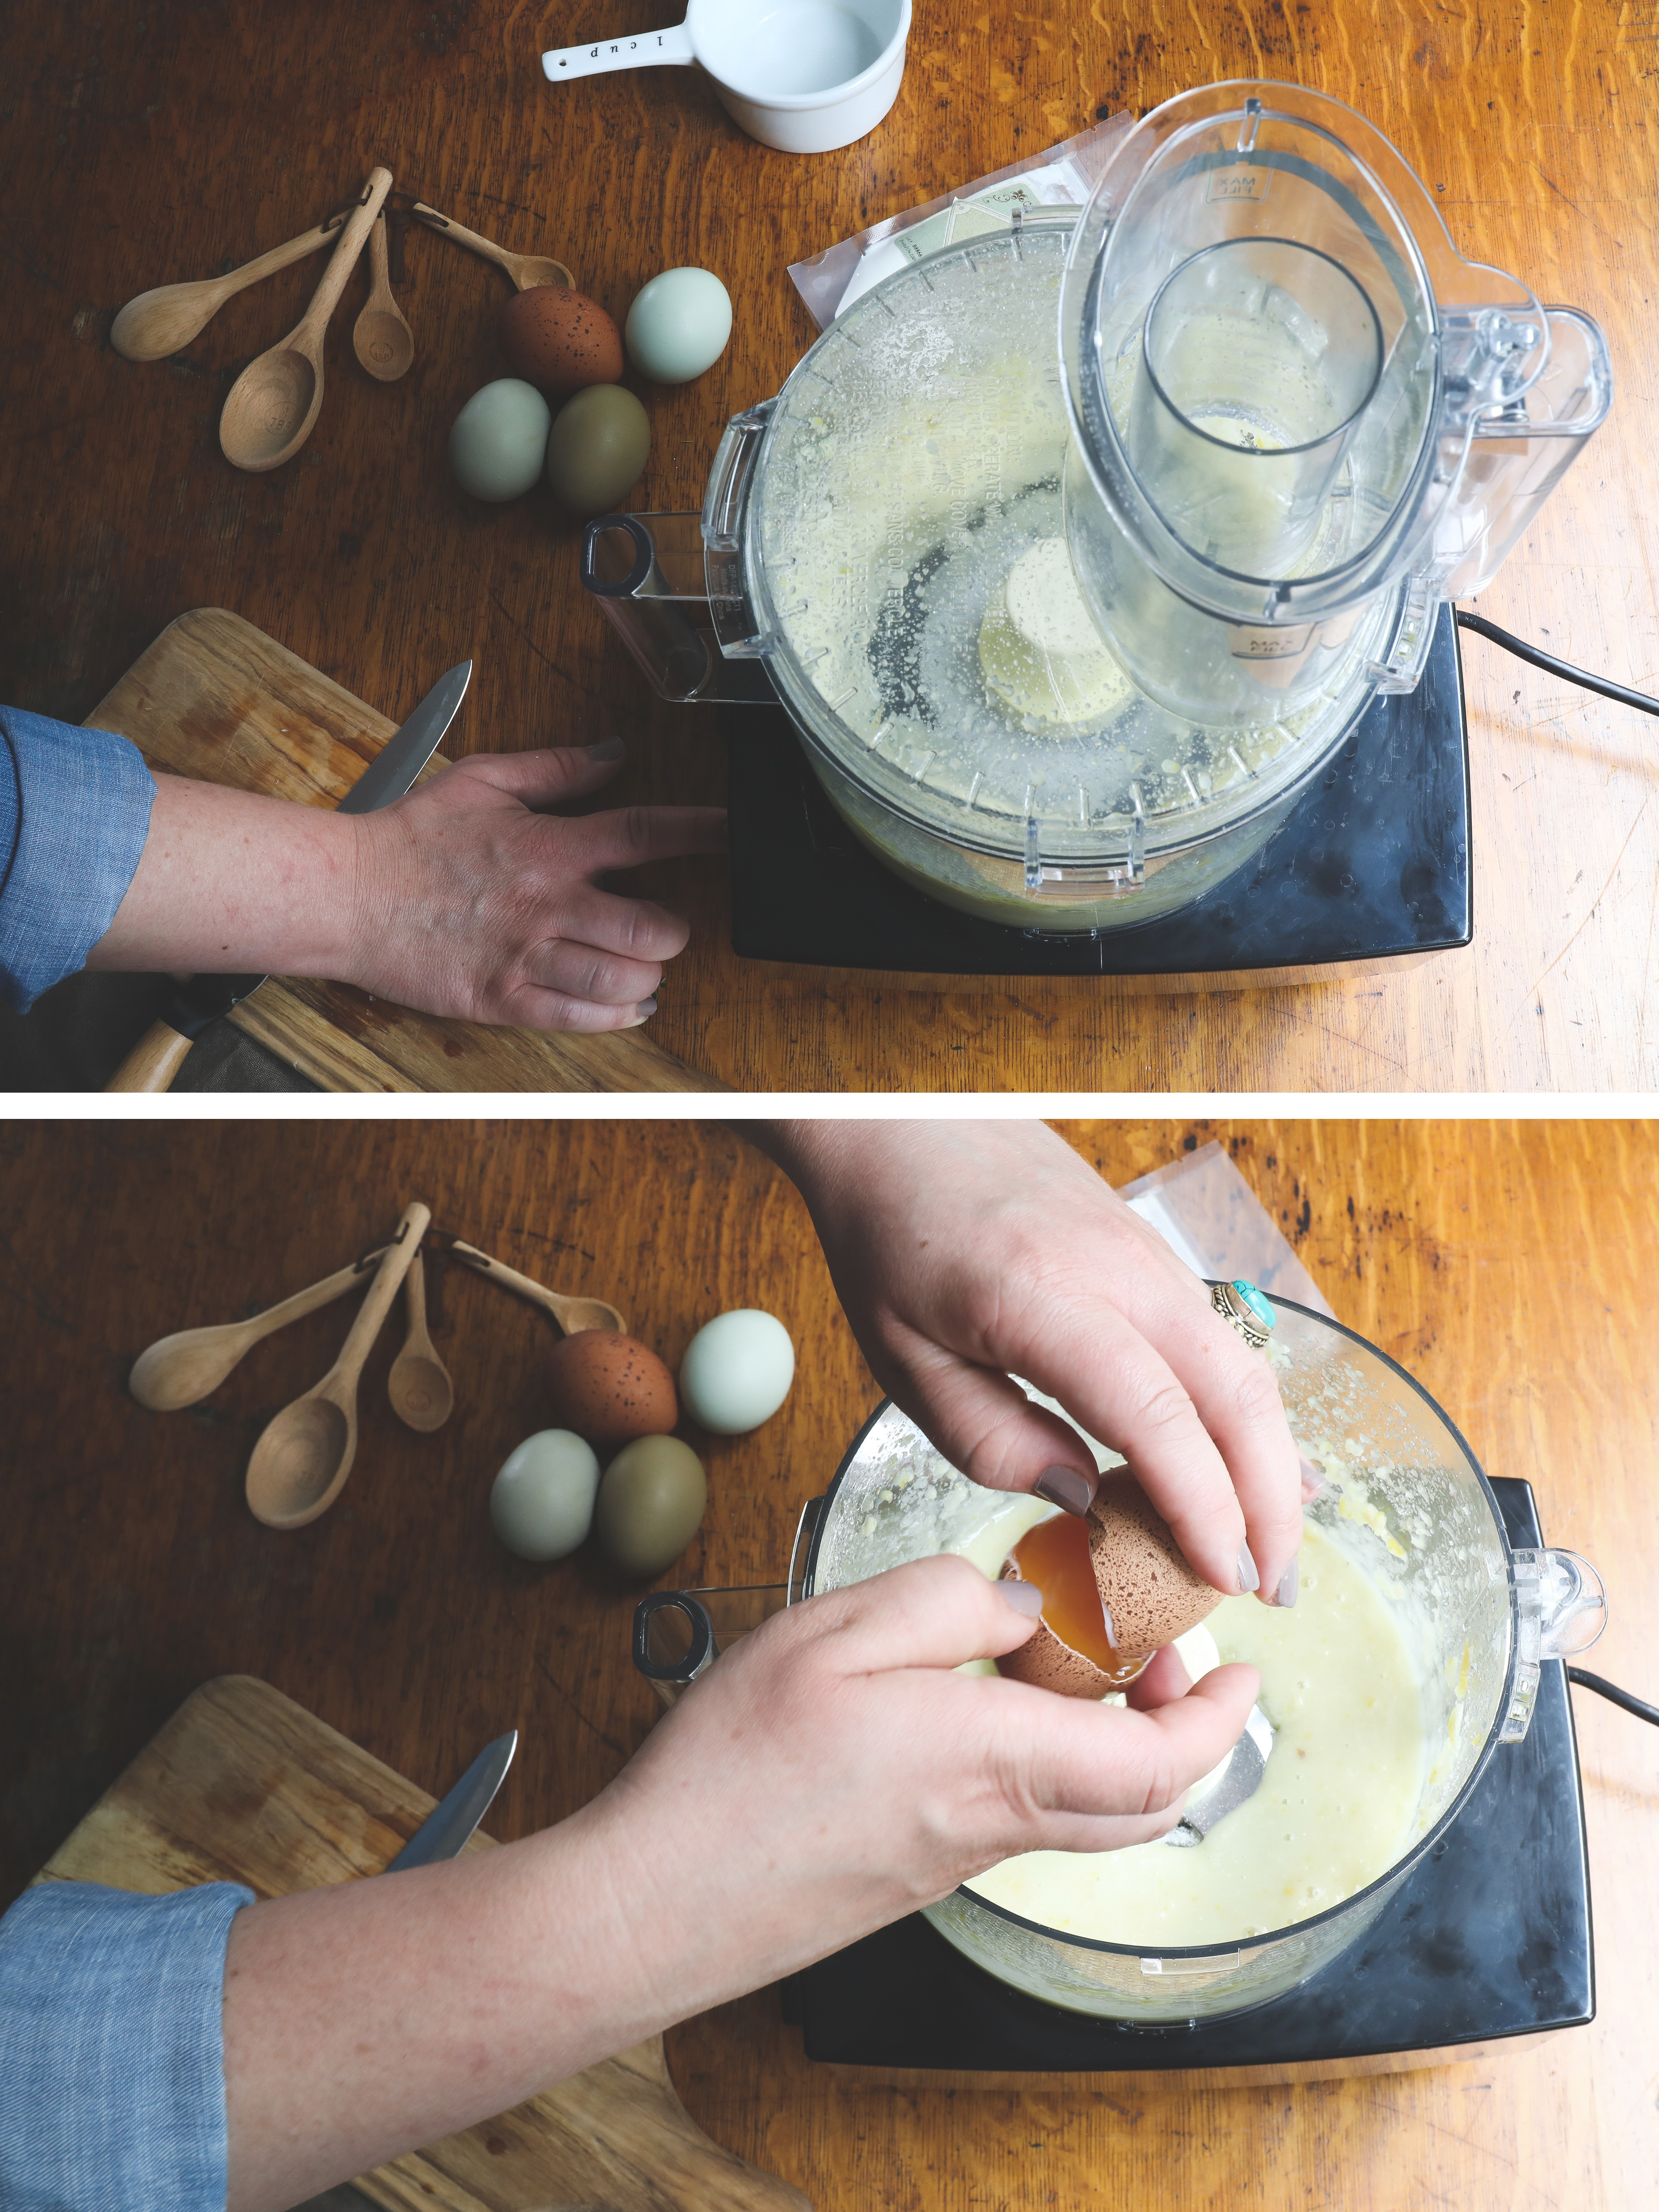 Hands cracking eggs into food processor to make lemon lavender thyme bars